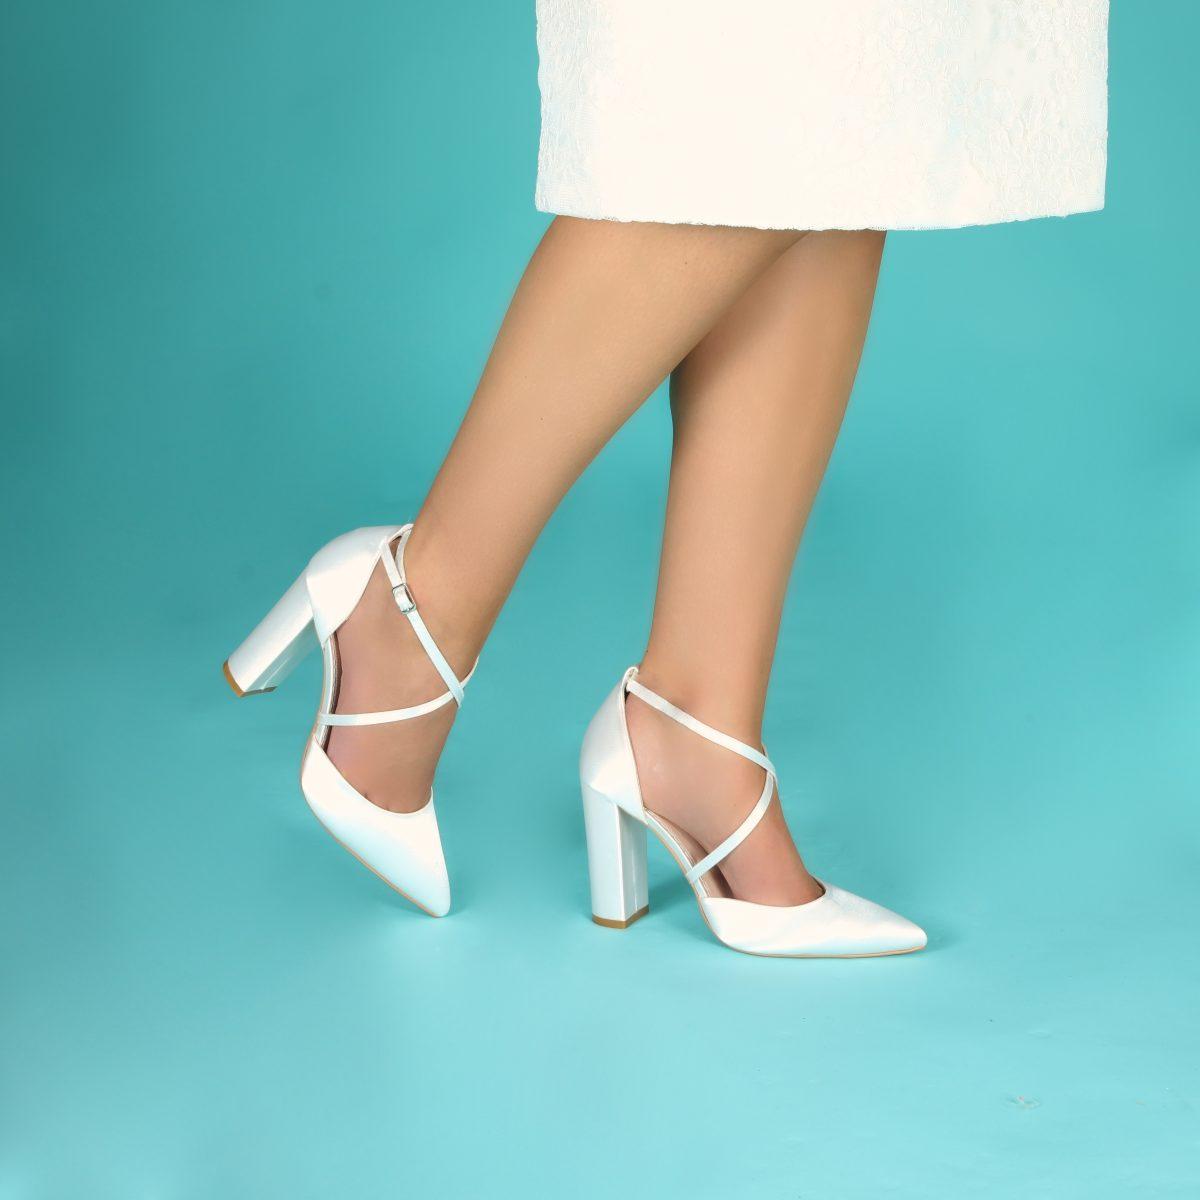 Perfect Bridal Keira Shoes - Ivory Satin 3